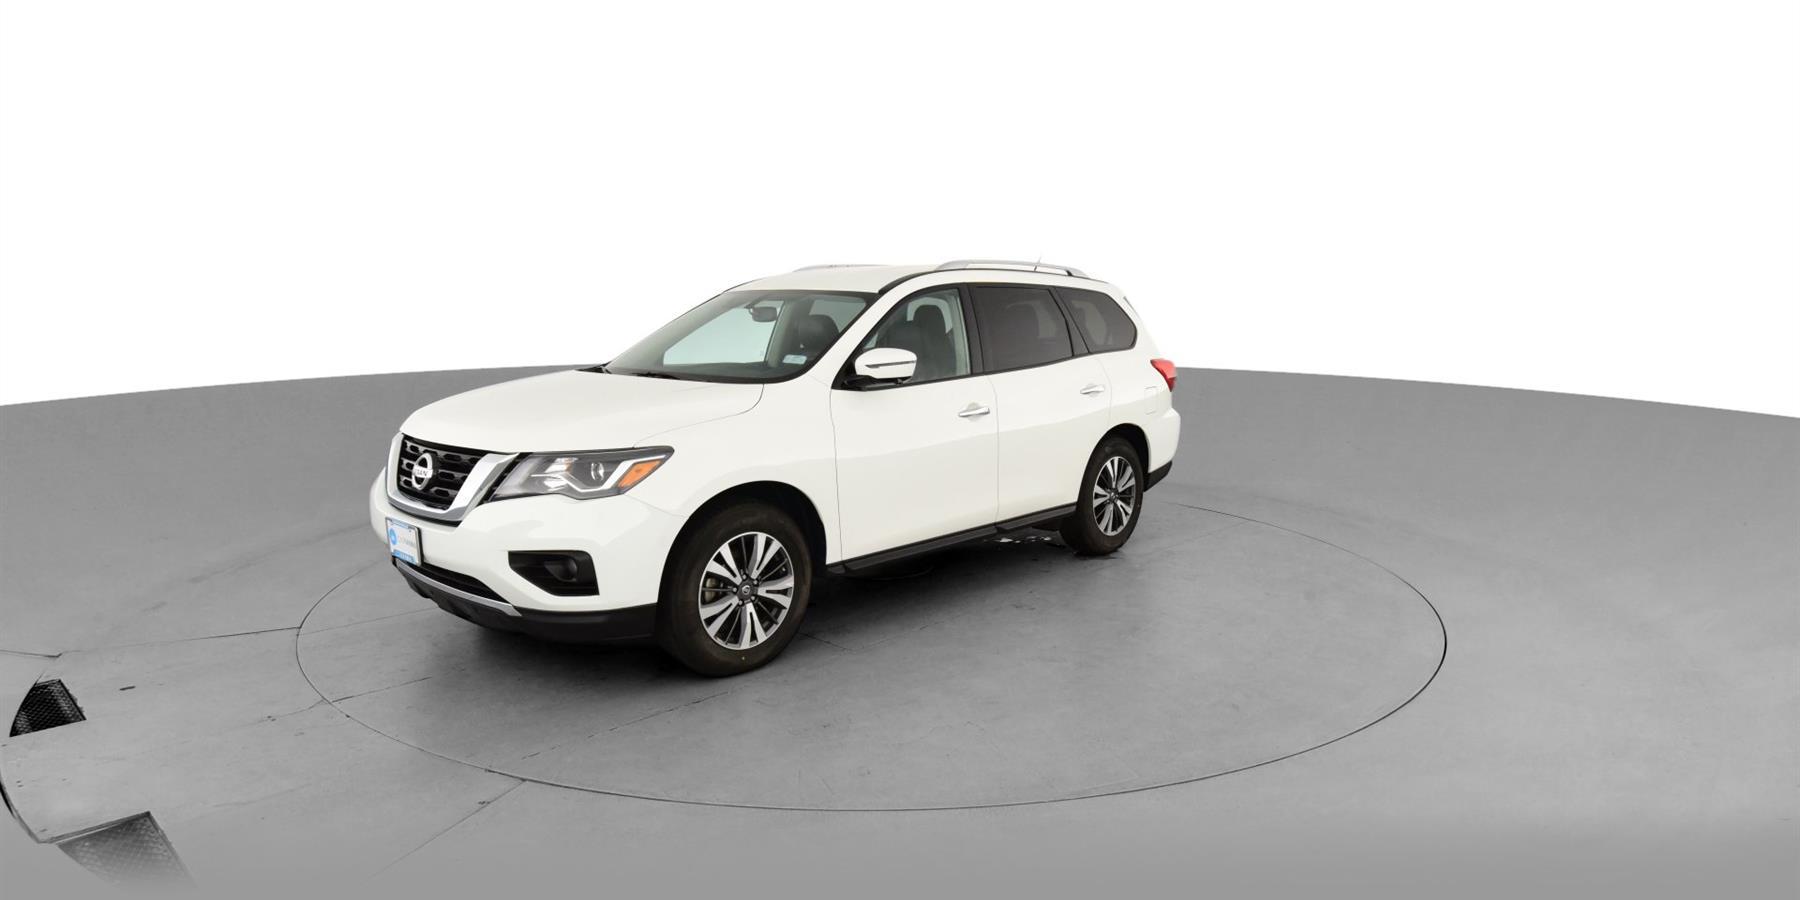 2017 Nissan Pathfinder SL Sport Utility 4D for Sale | Carvana®